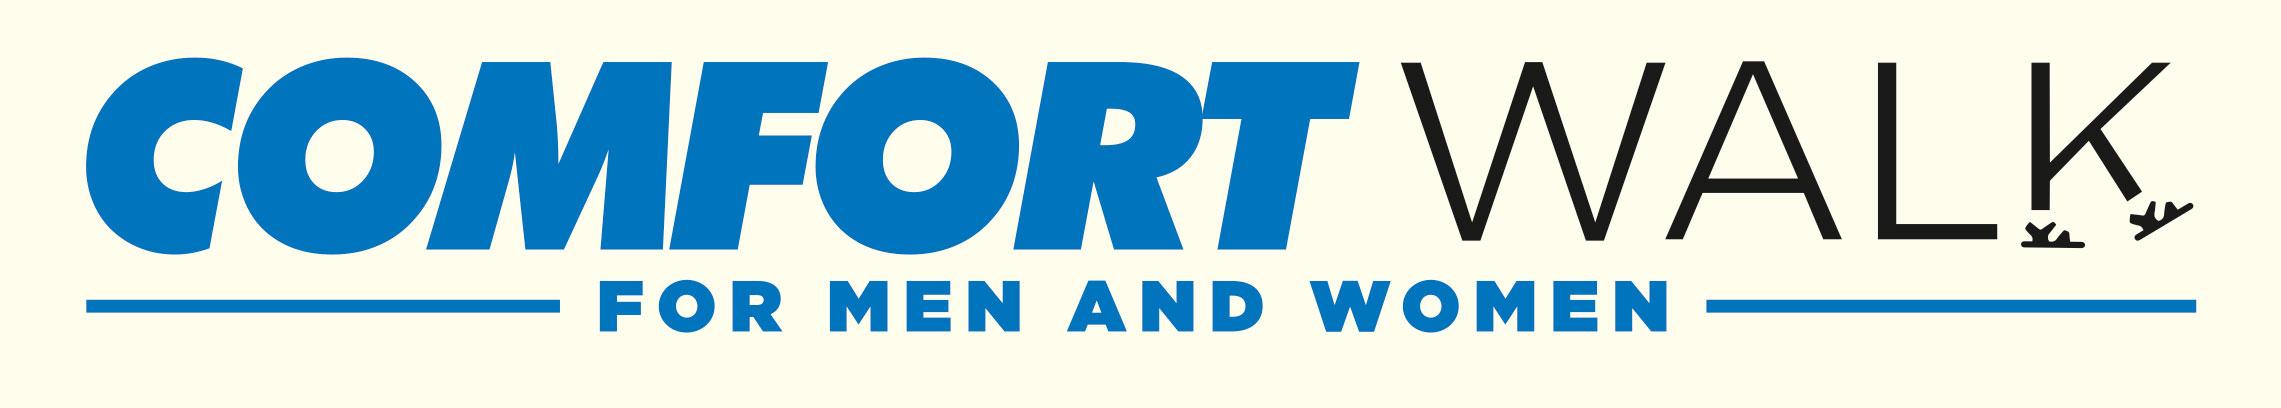 Comfortwalk logo